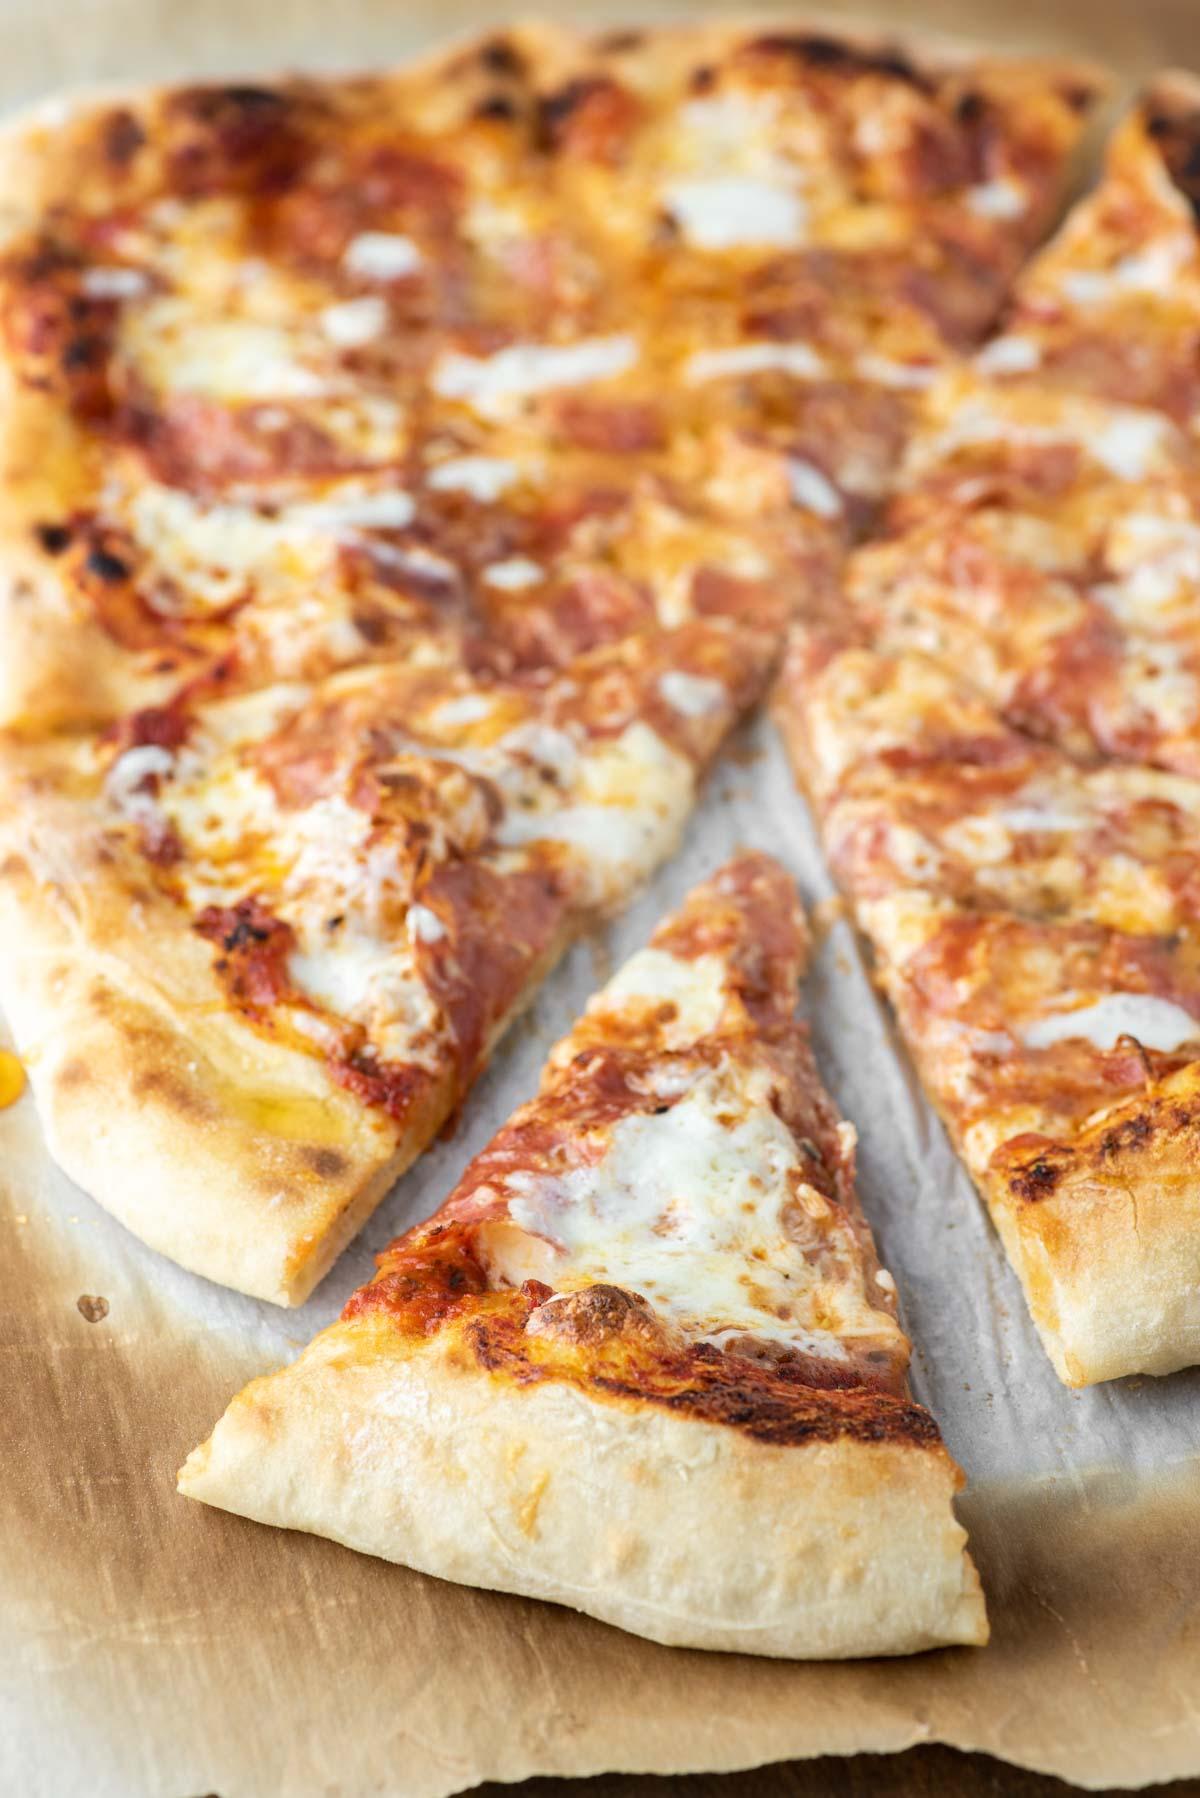 honey-drizzled salami pizza on parchment paper